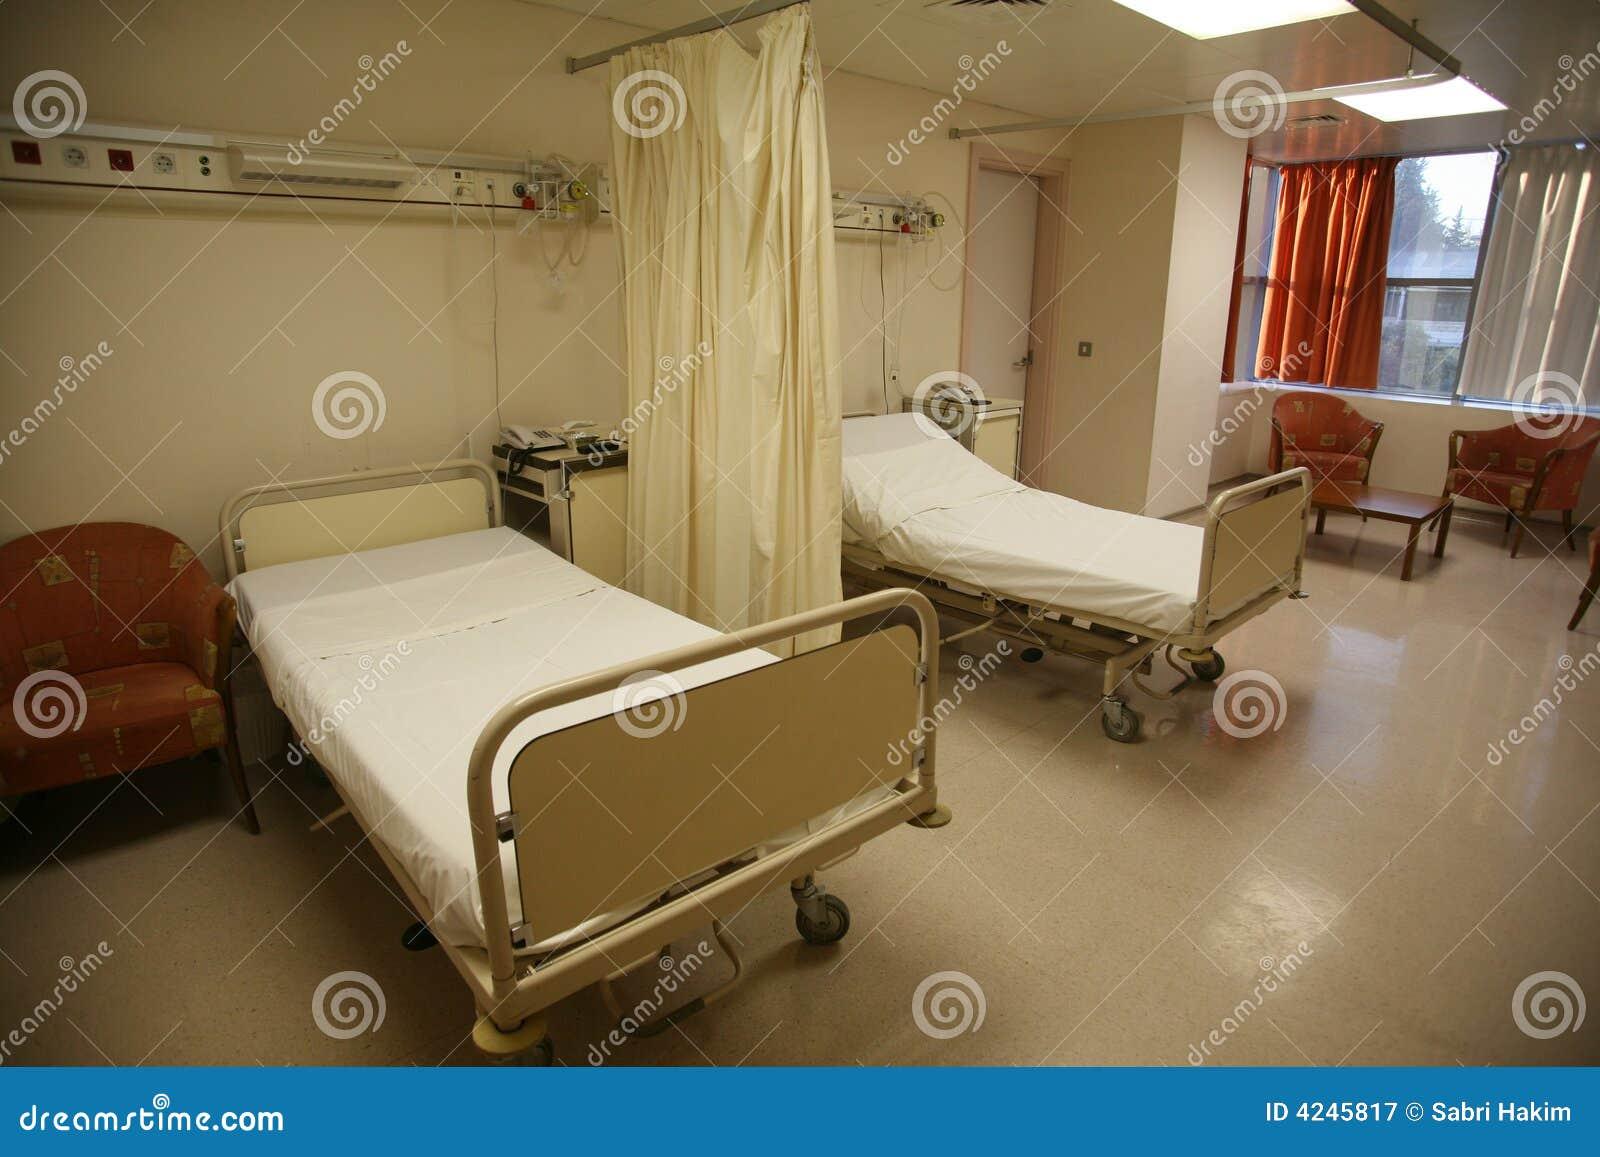 Hospital bed bedroom